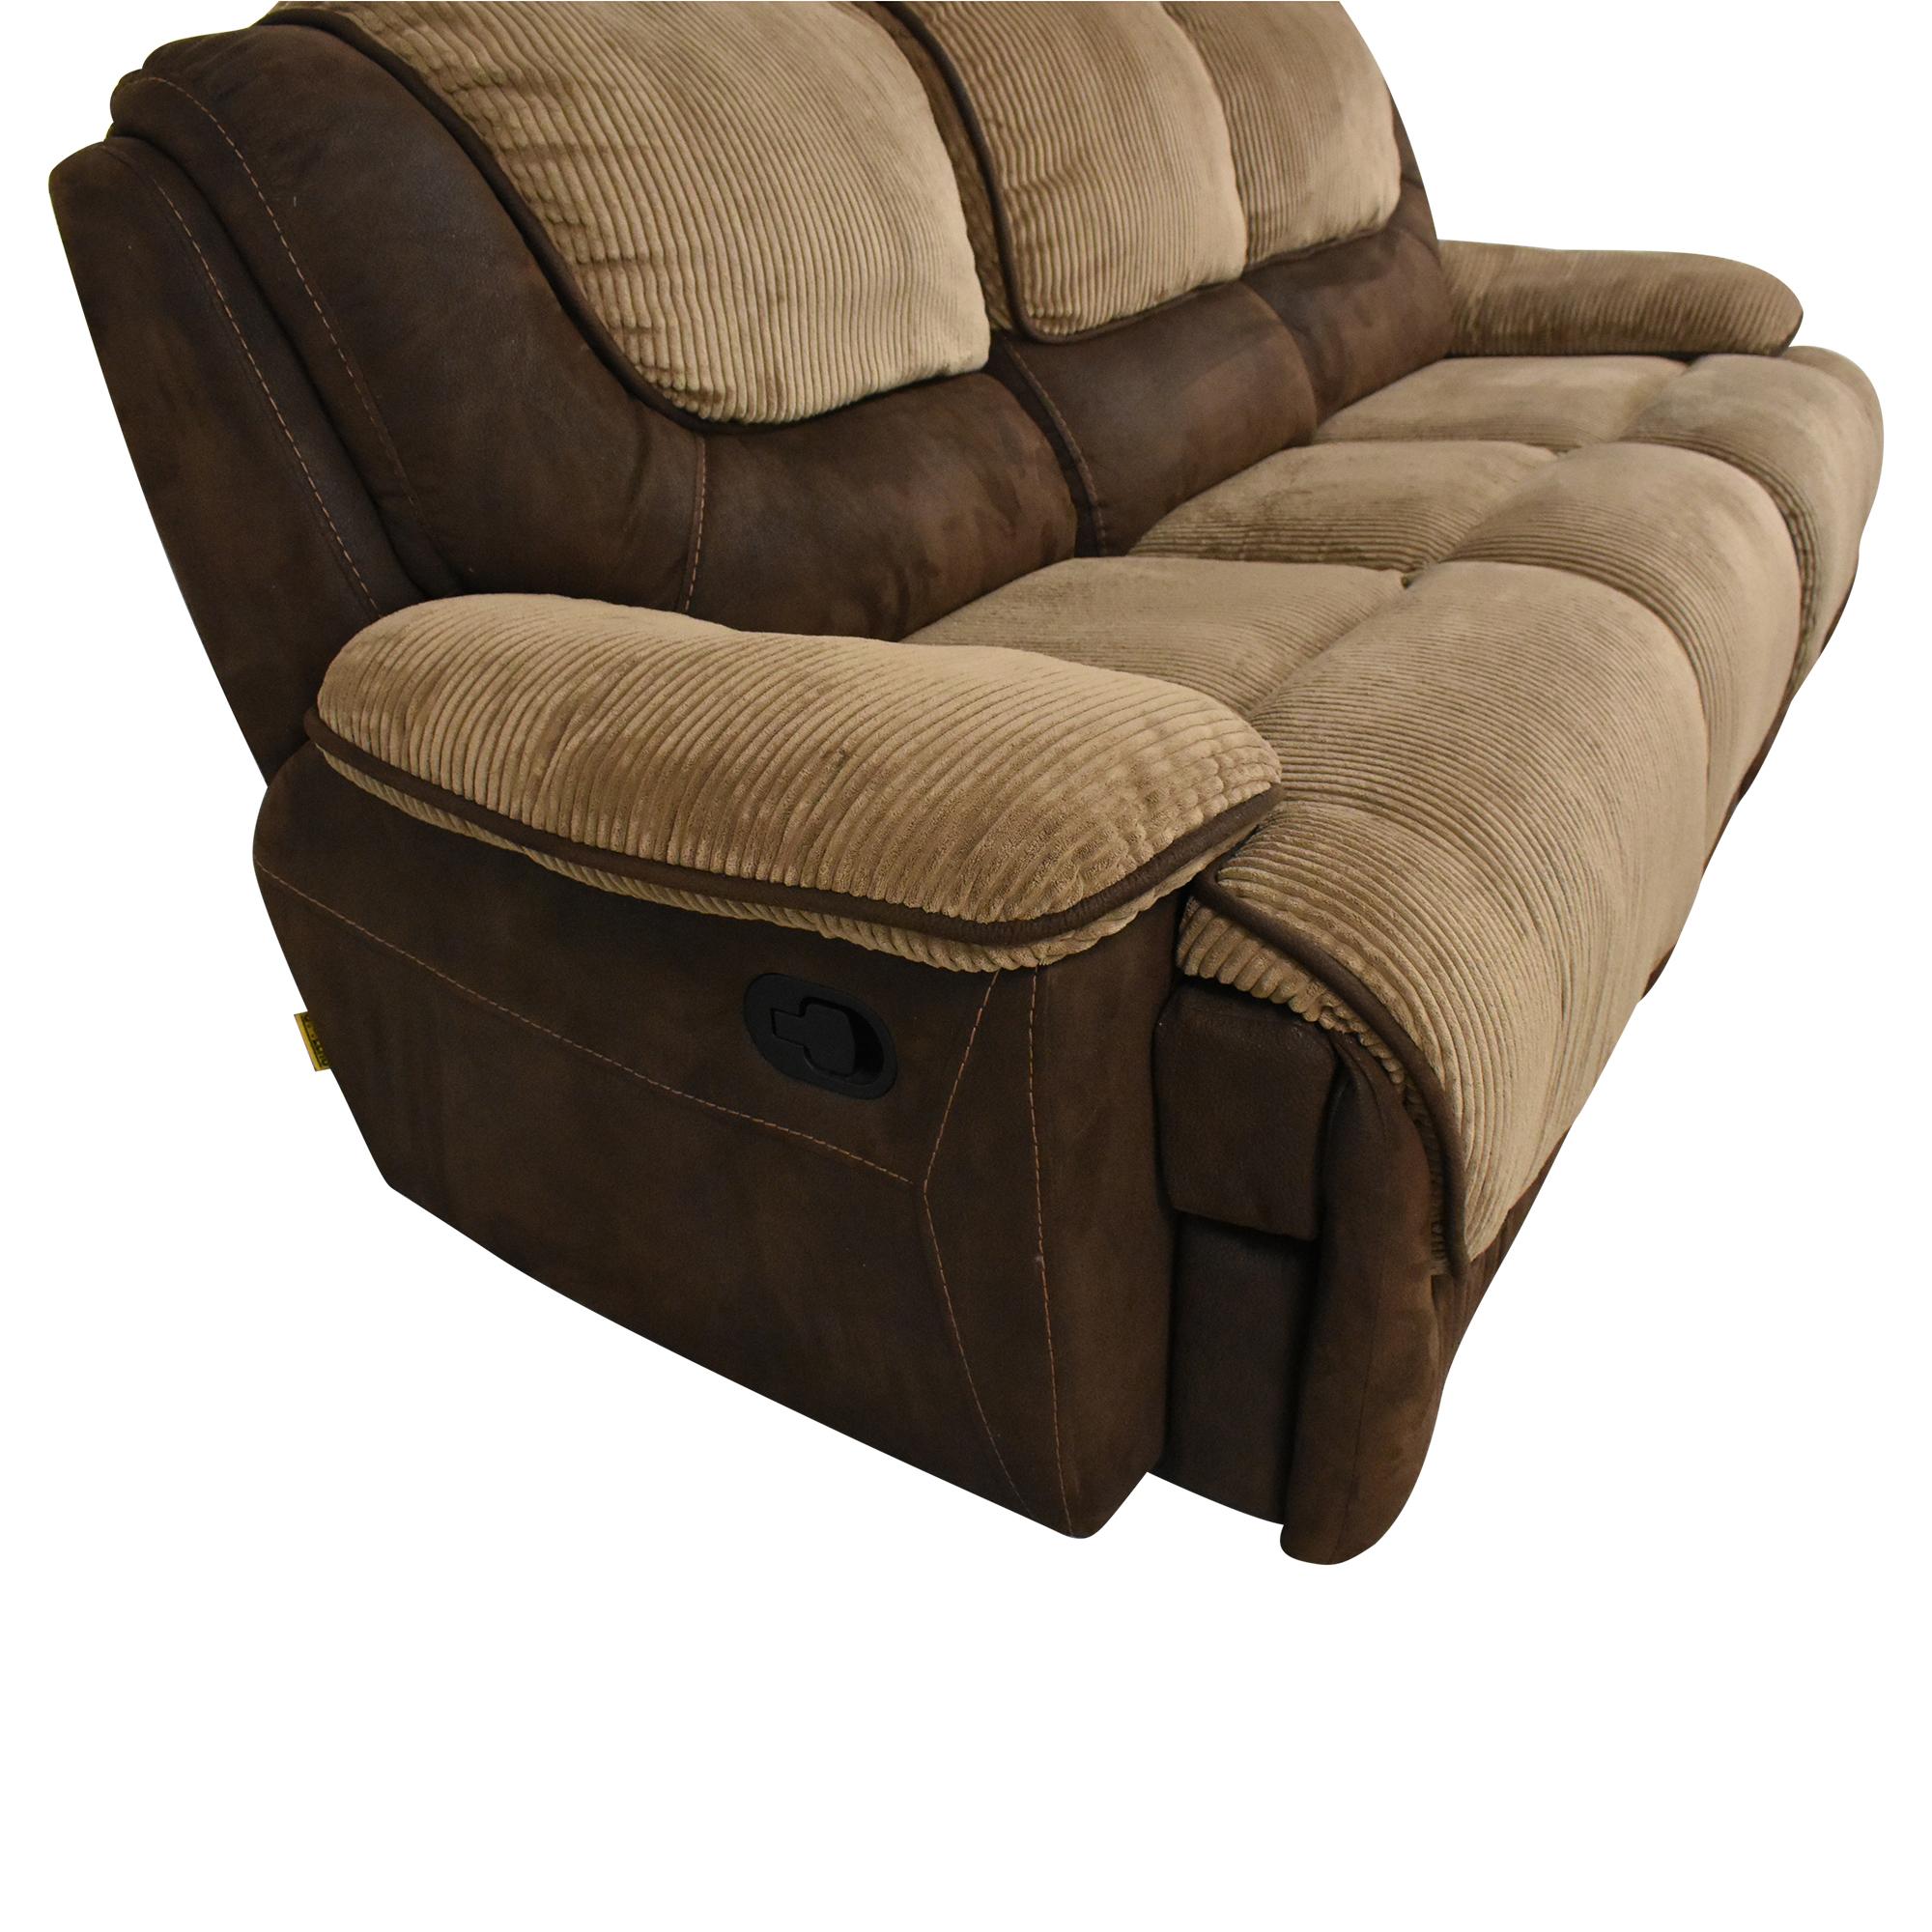 buy Two Tone Reclining Sofa